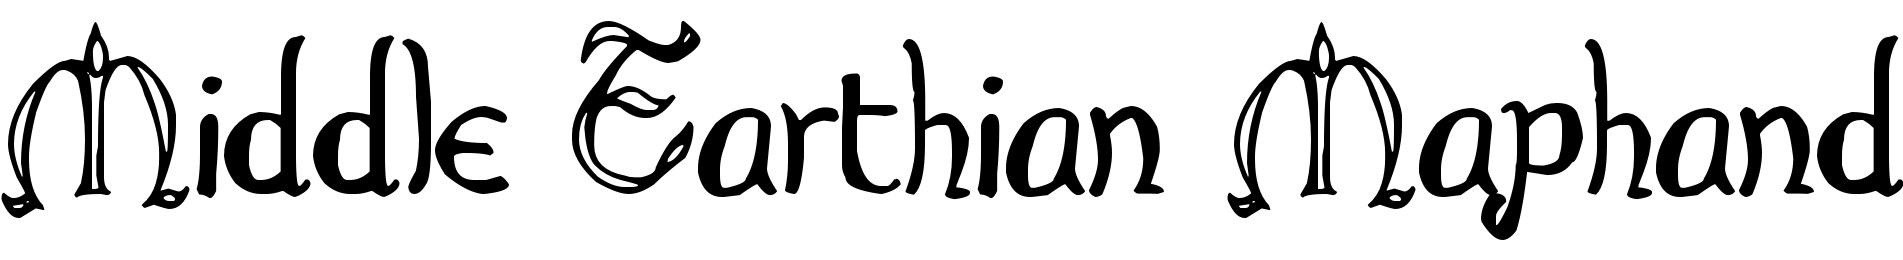 Middle Earthian Maphand